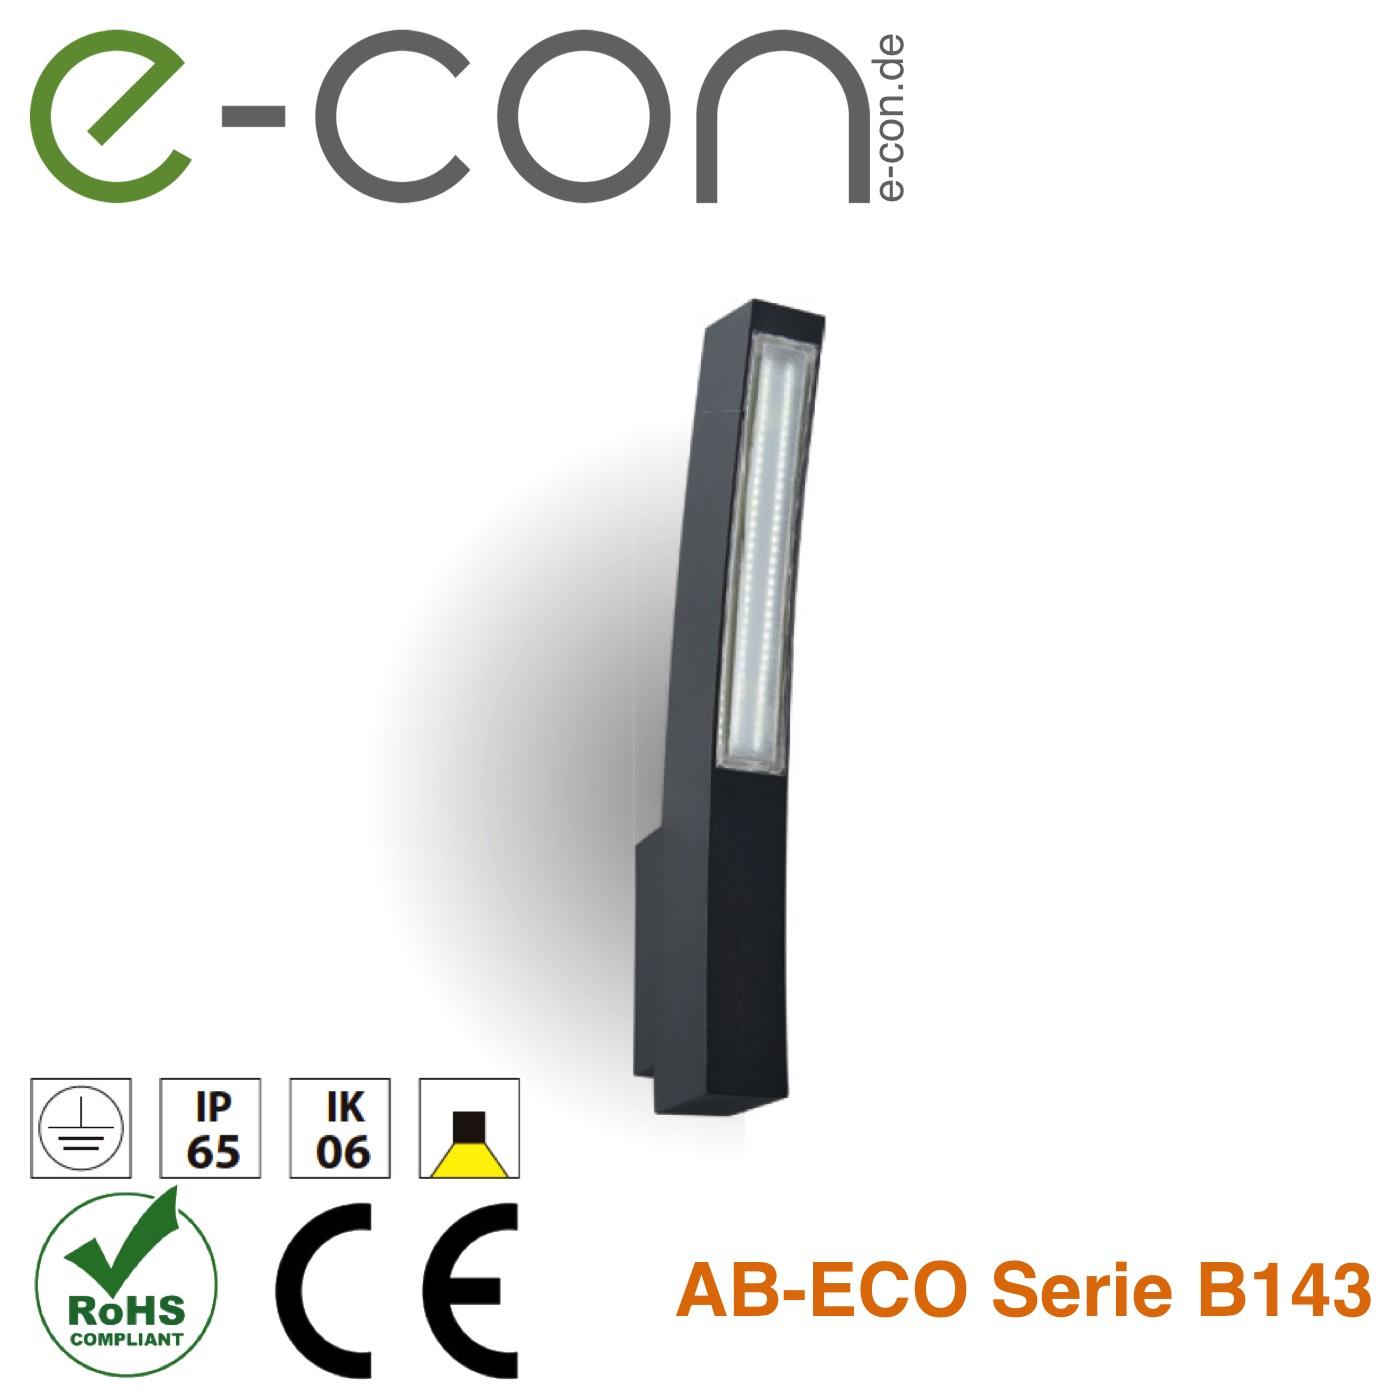 AB-ECO Serie B143